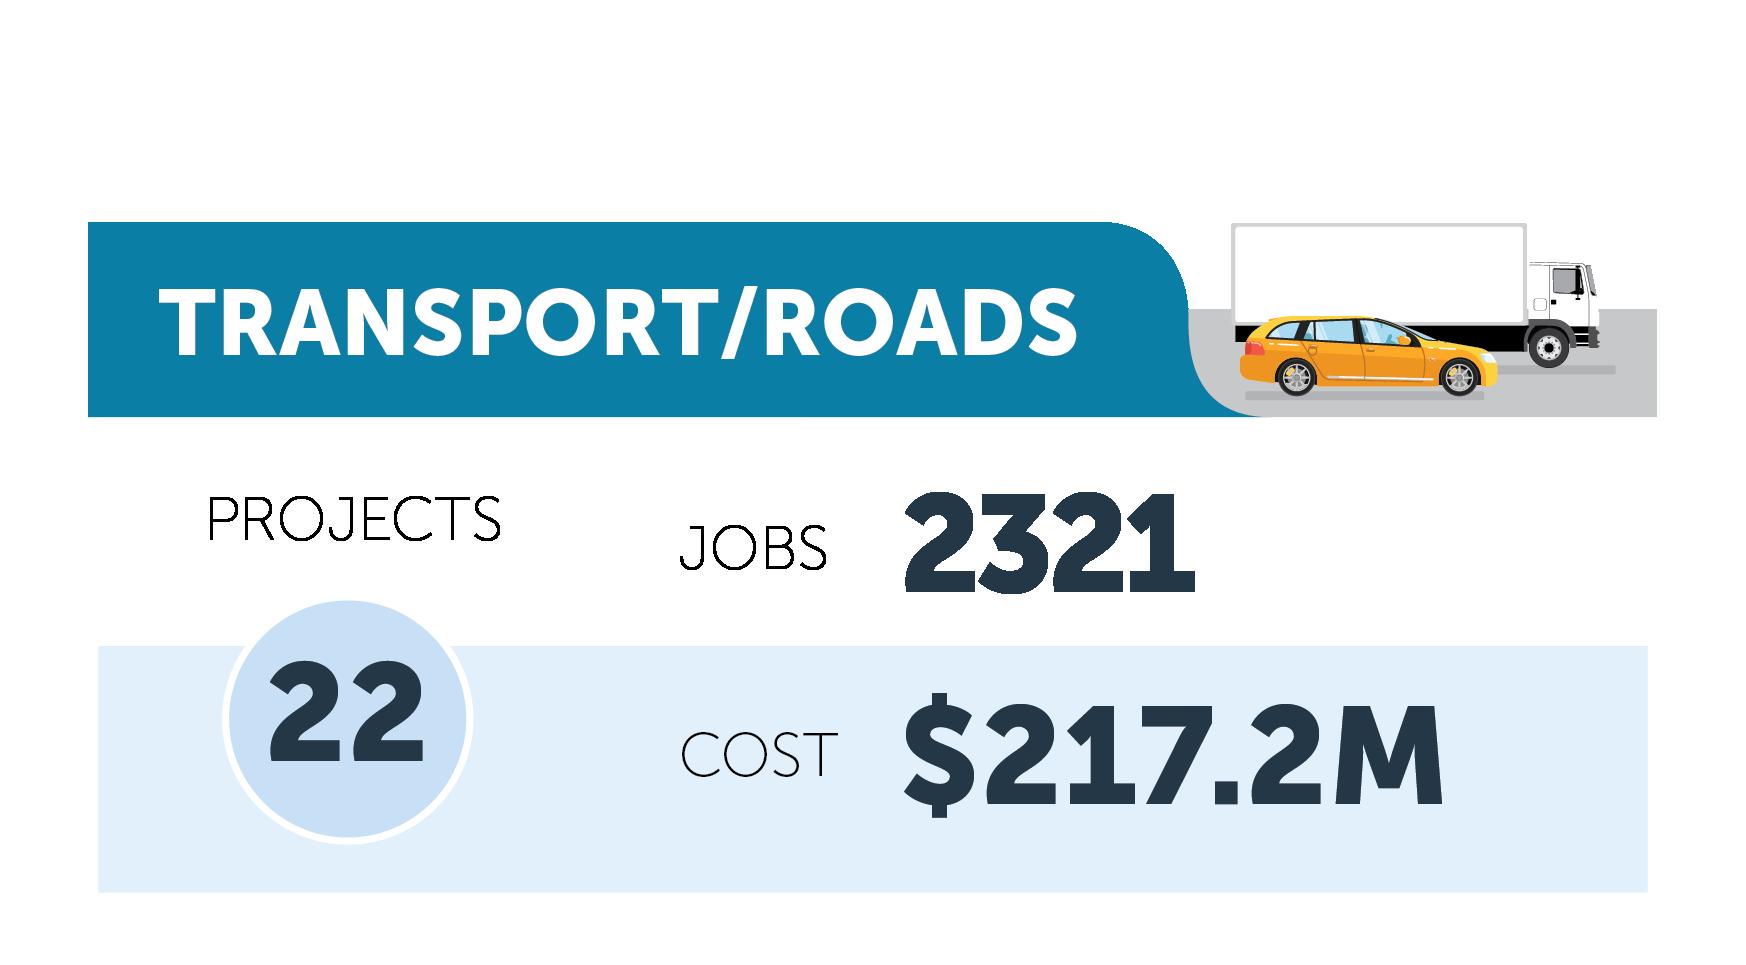 Transport/Roads figures